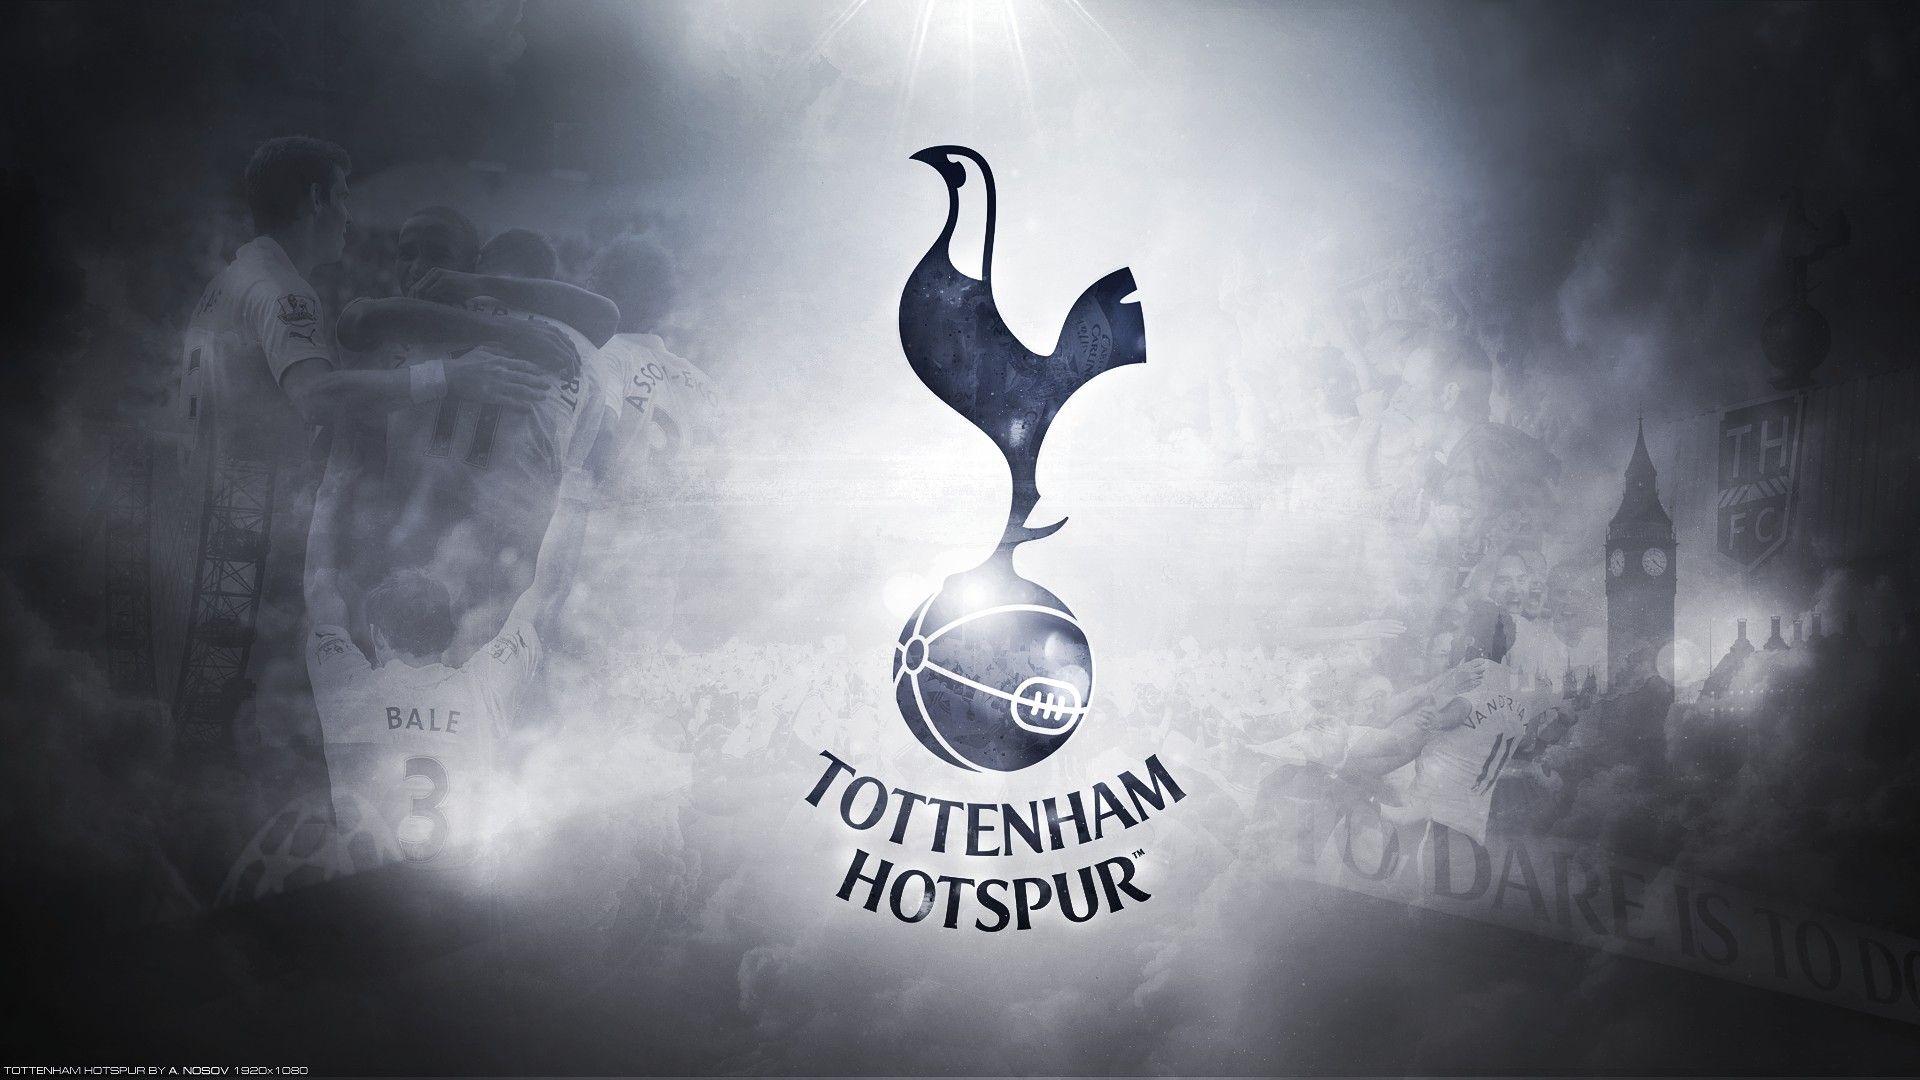 Tottenham Hotspur vs Qarabag Prediksi Bola Tottenham hotspur 1920x1080